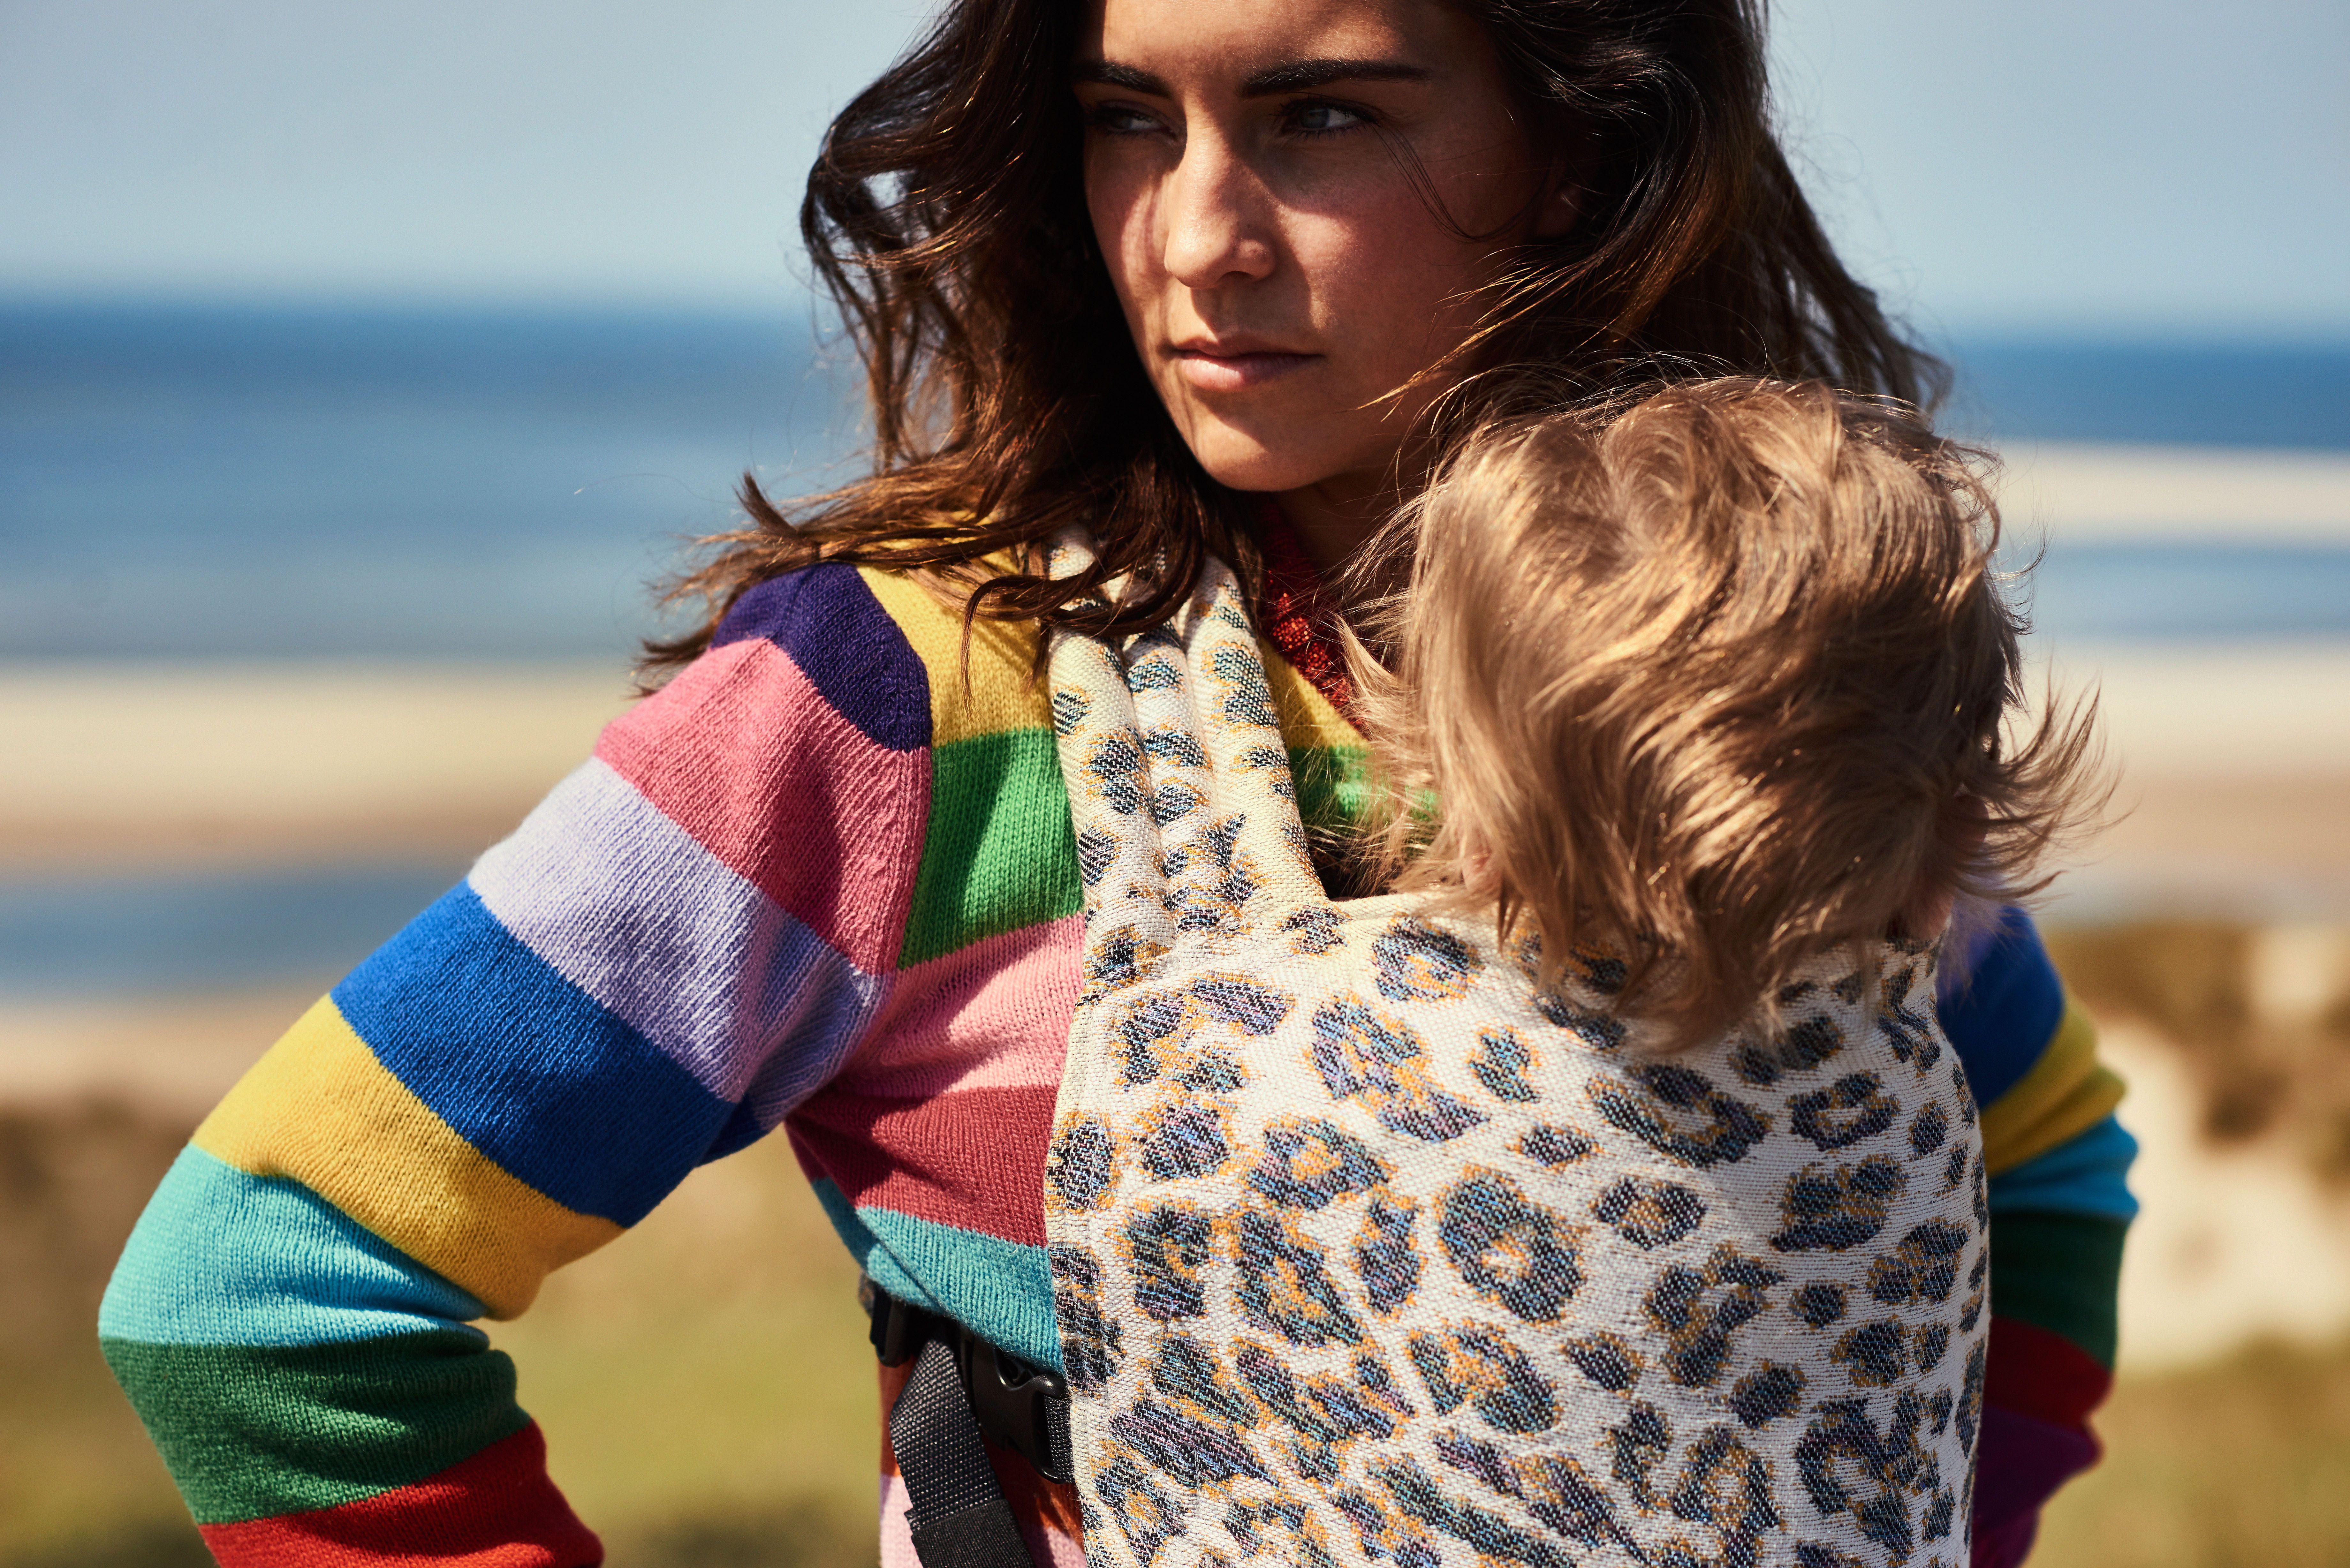 Zeitgeist Baby Carrier All About Babywearing Artipoppe Love